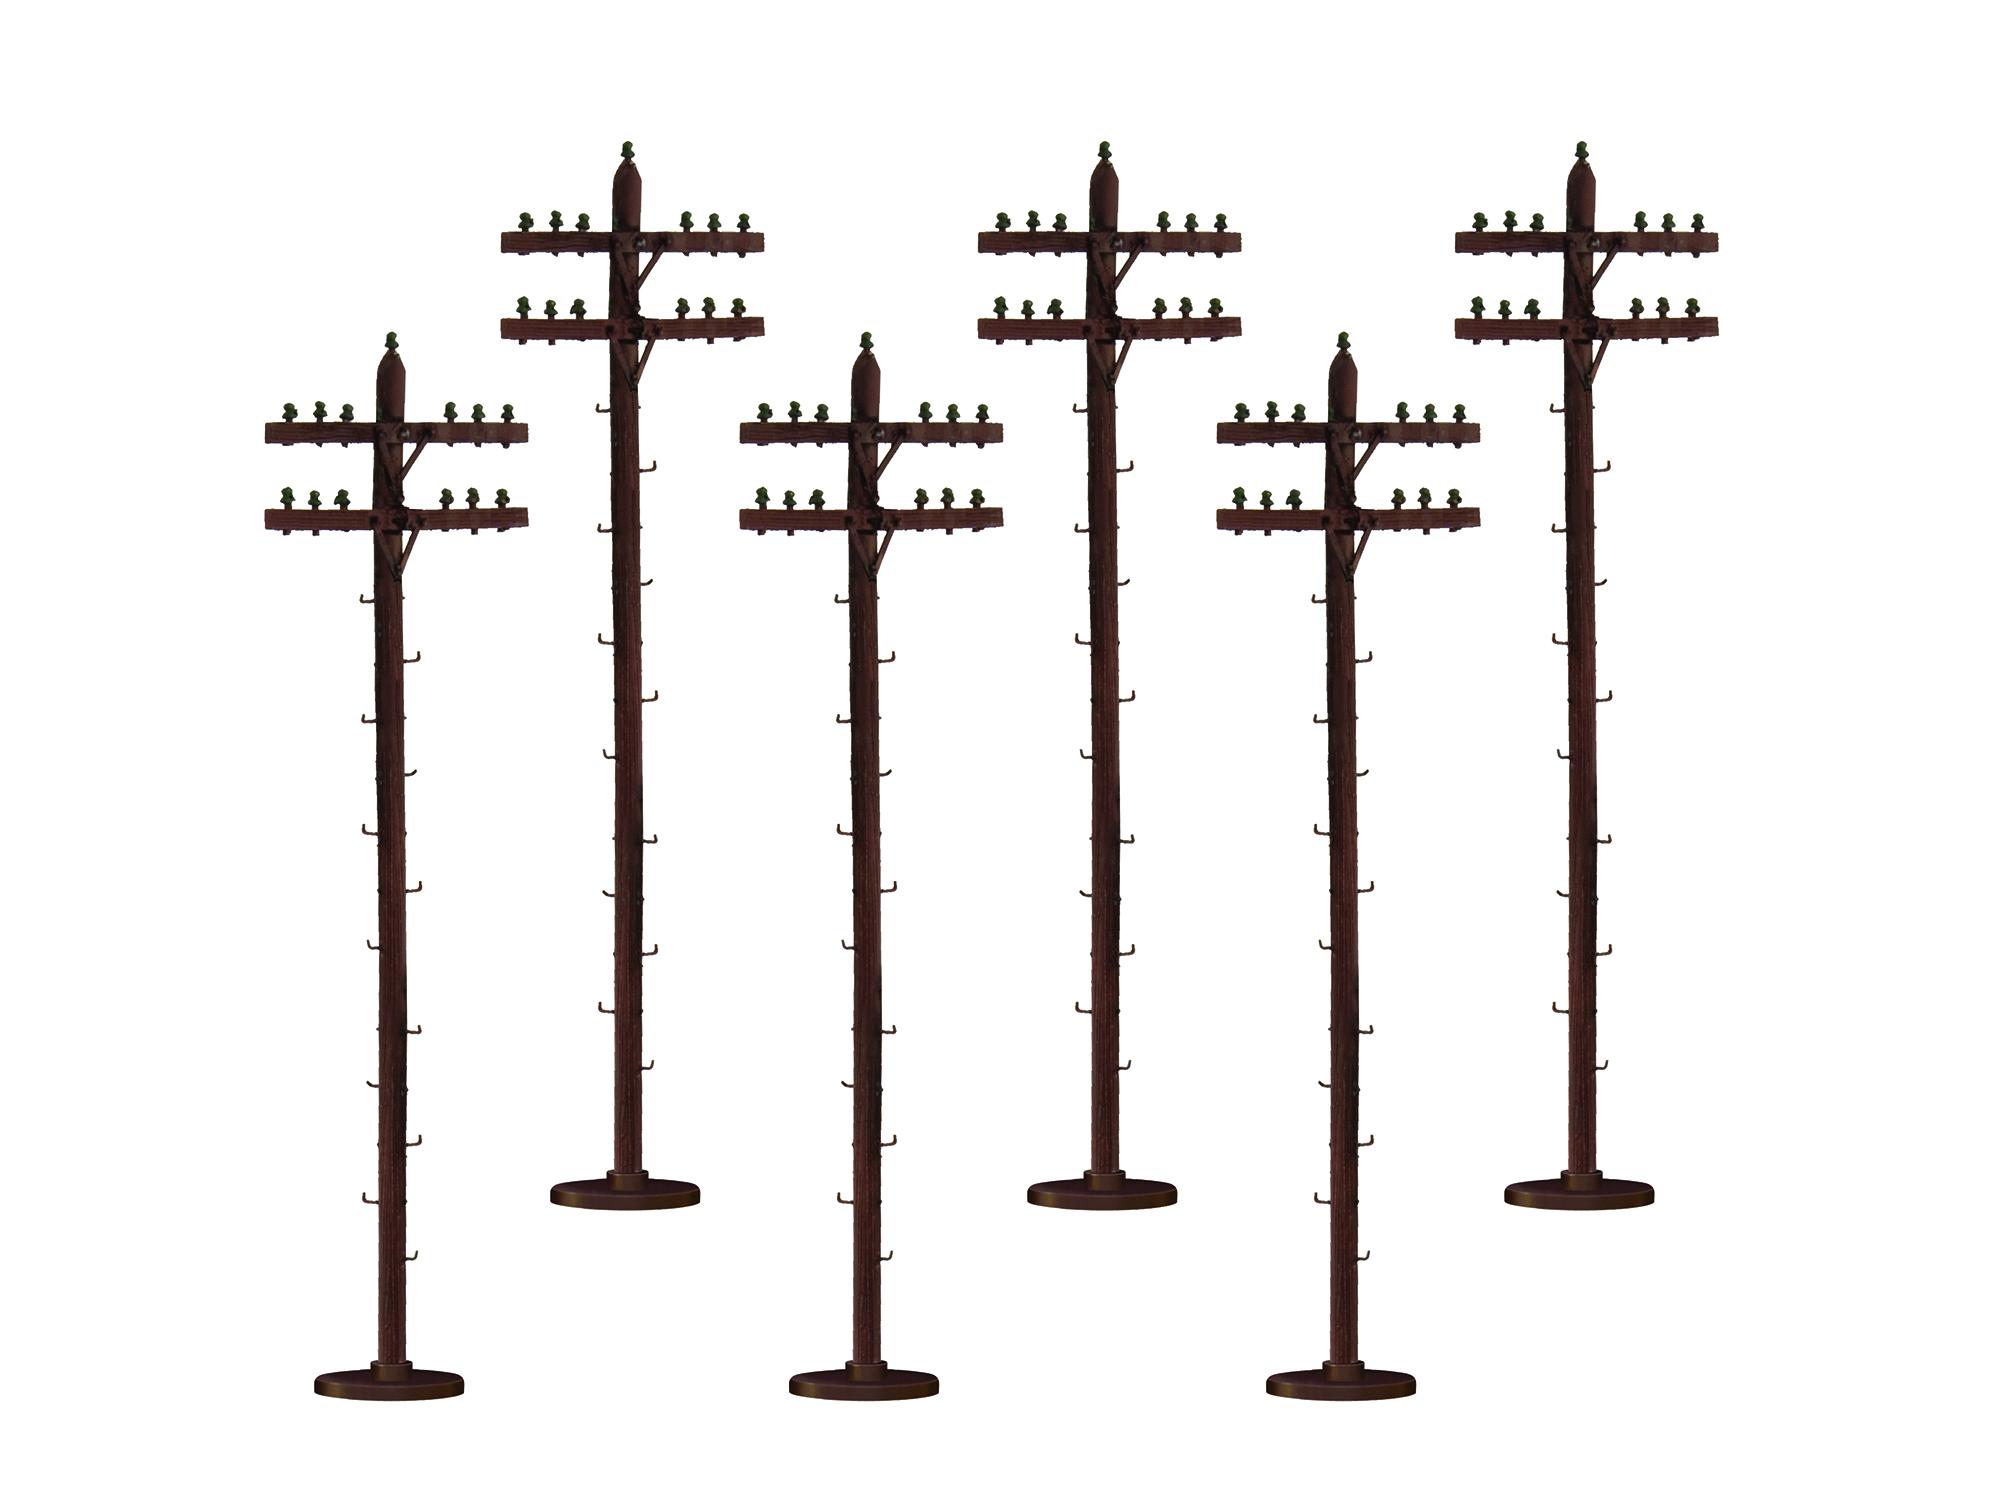 "Lionel 637851 O Scale Telephone/Utility Poles Kit Kit 7-1/2"" Tall pkg 6"